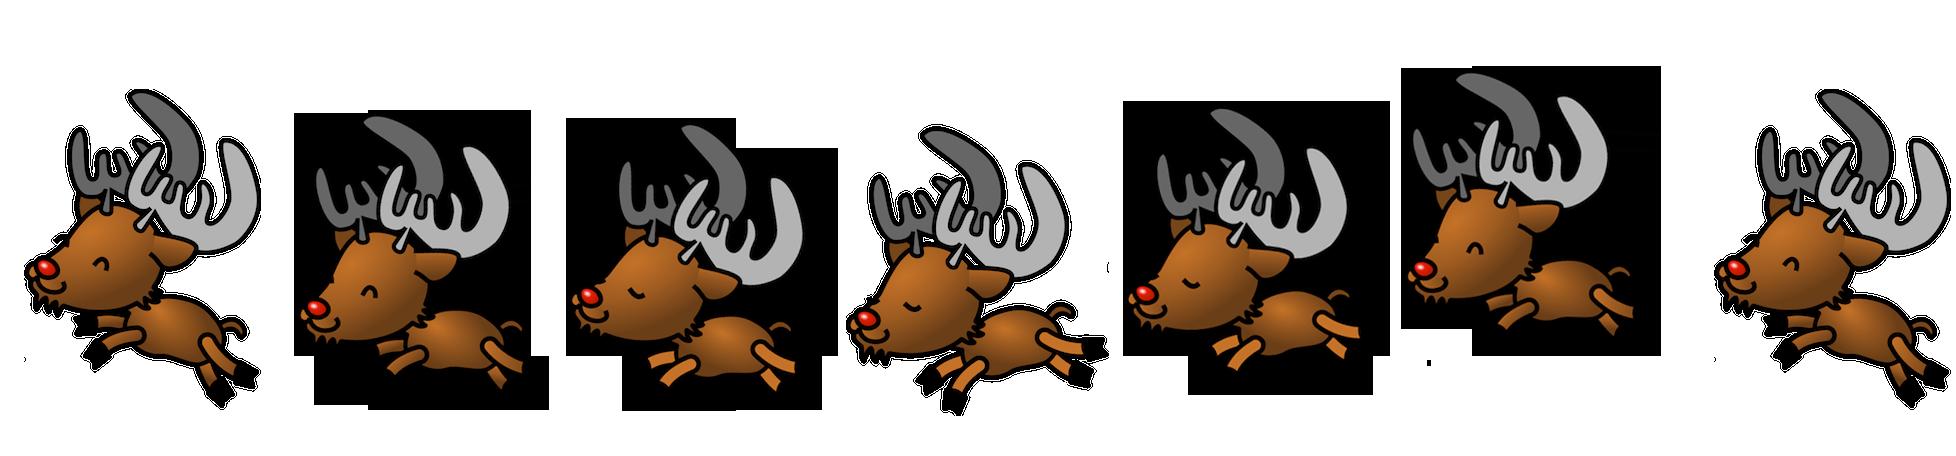 Dancing reindeer clipart clipart Free Dance Reindeer Cliparts, Download Free Clip Art, Free ... clipart